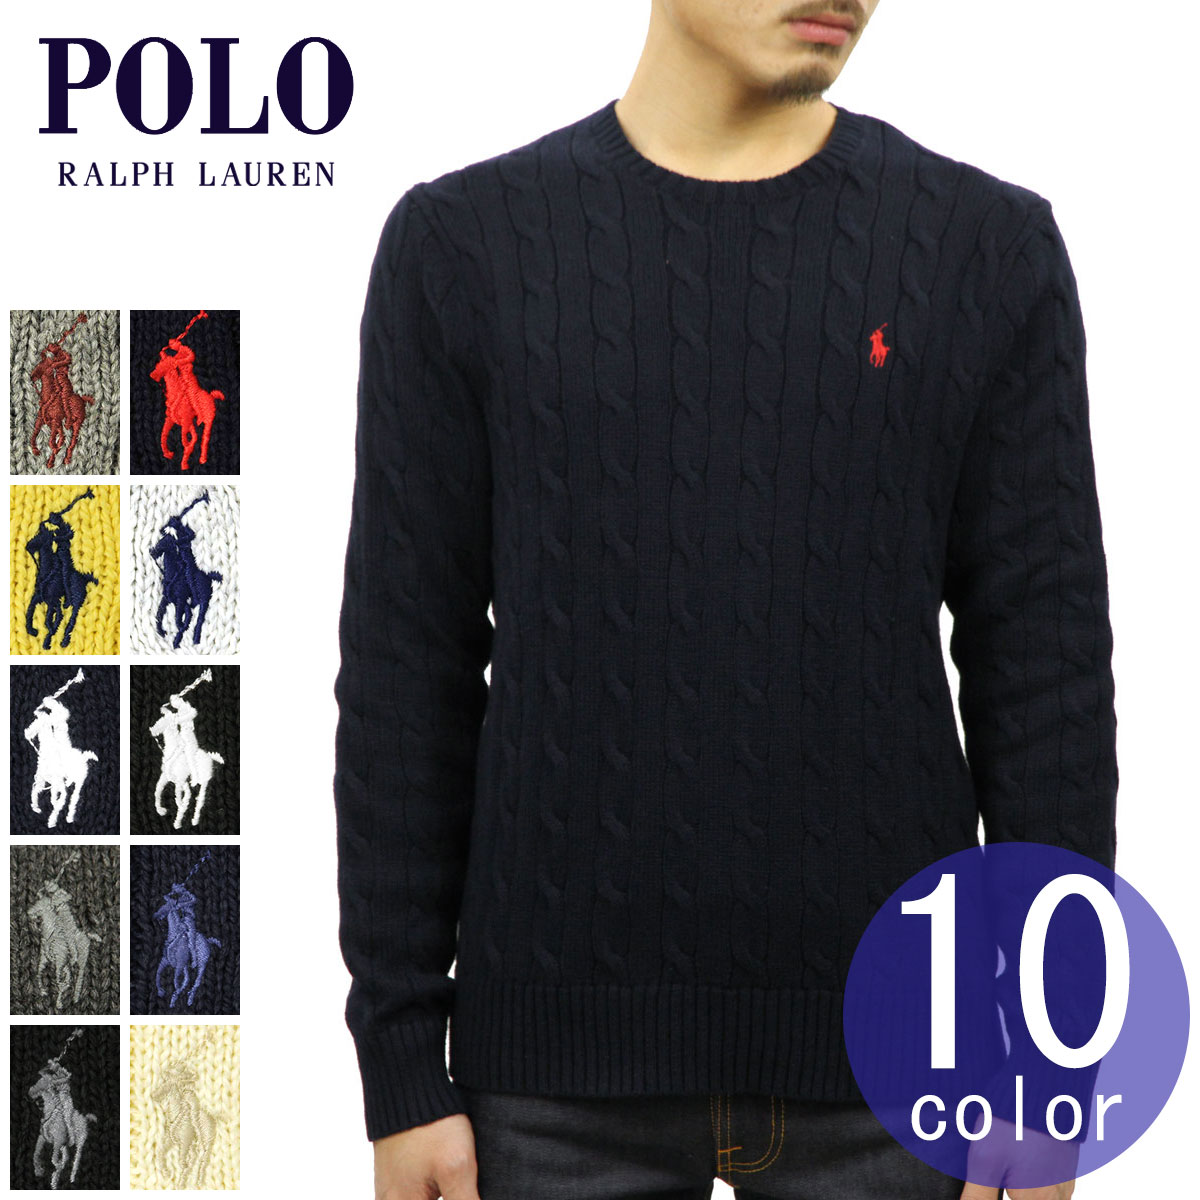 c5410ca250a5 Rakuten Ichiba shop MIXON  Polo Ralph Lauren POLO RALPH LAUREN regular  article men one point cotton cable knit sweater CABLE-KNIT COTTON SWEATER